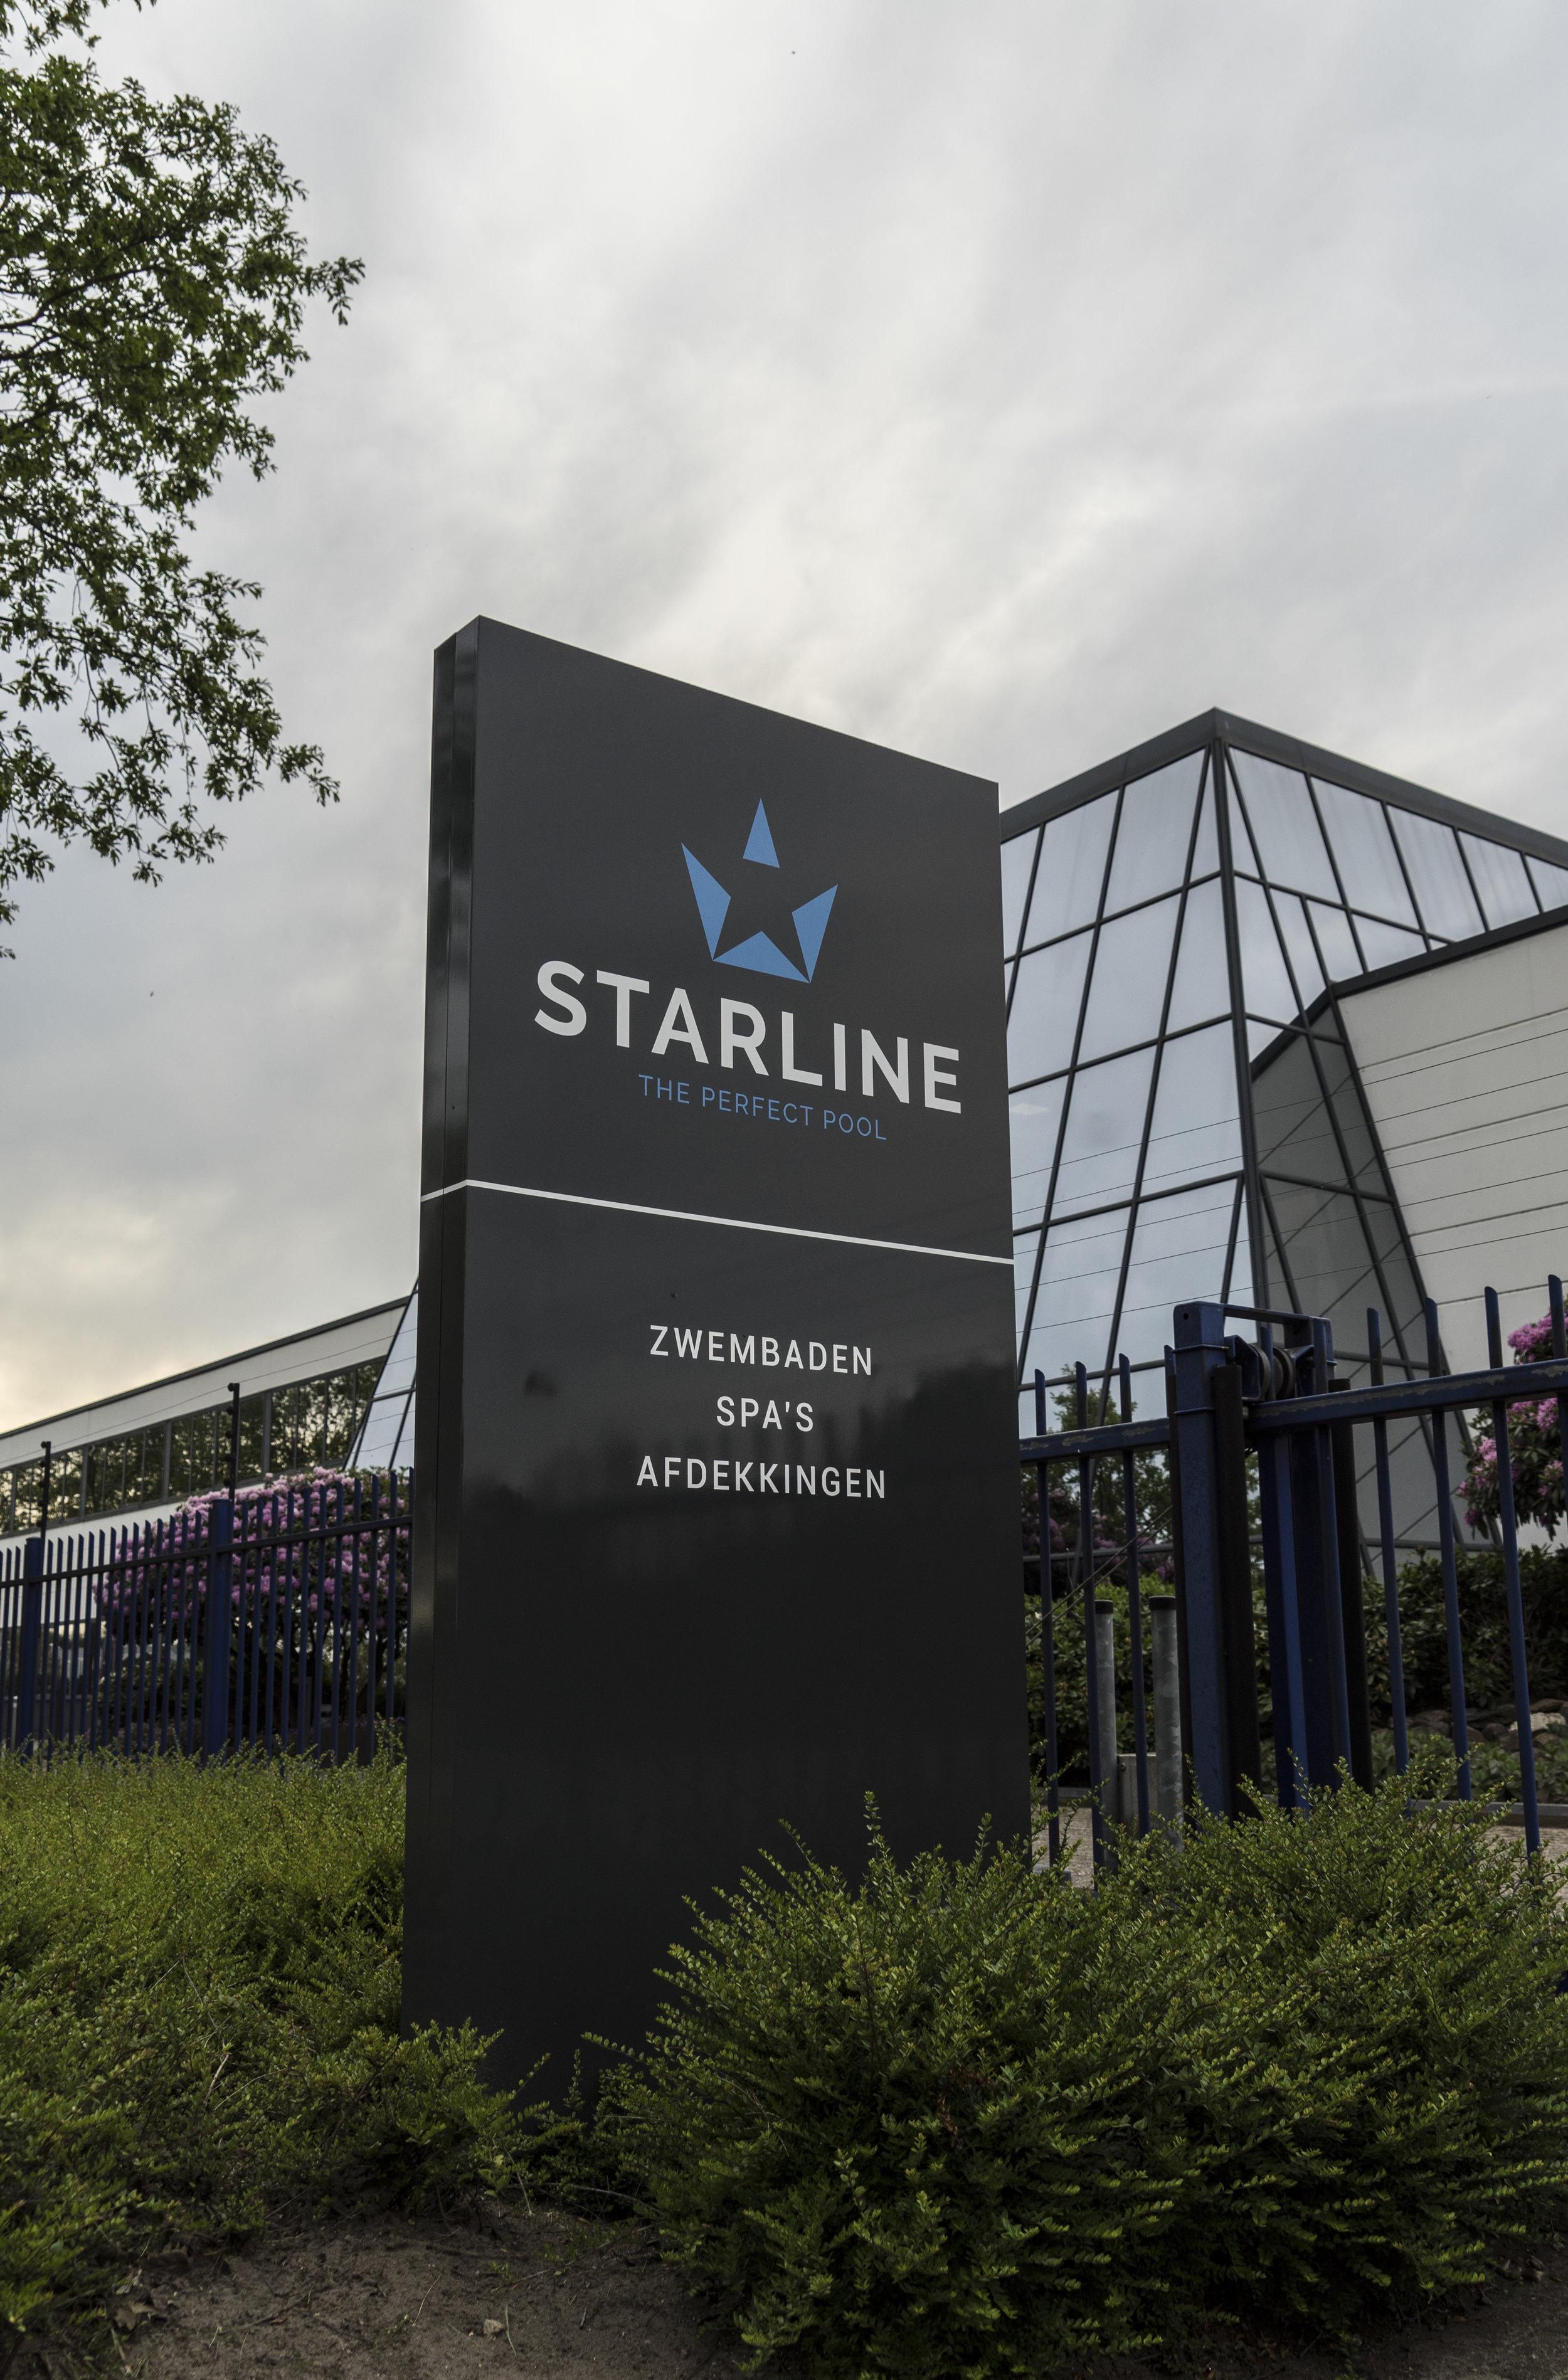 starline (1 van 2).jpg